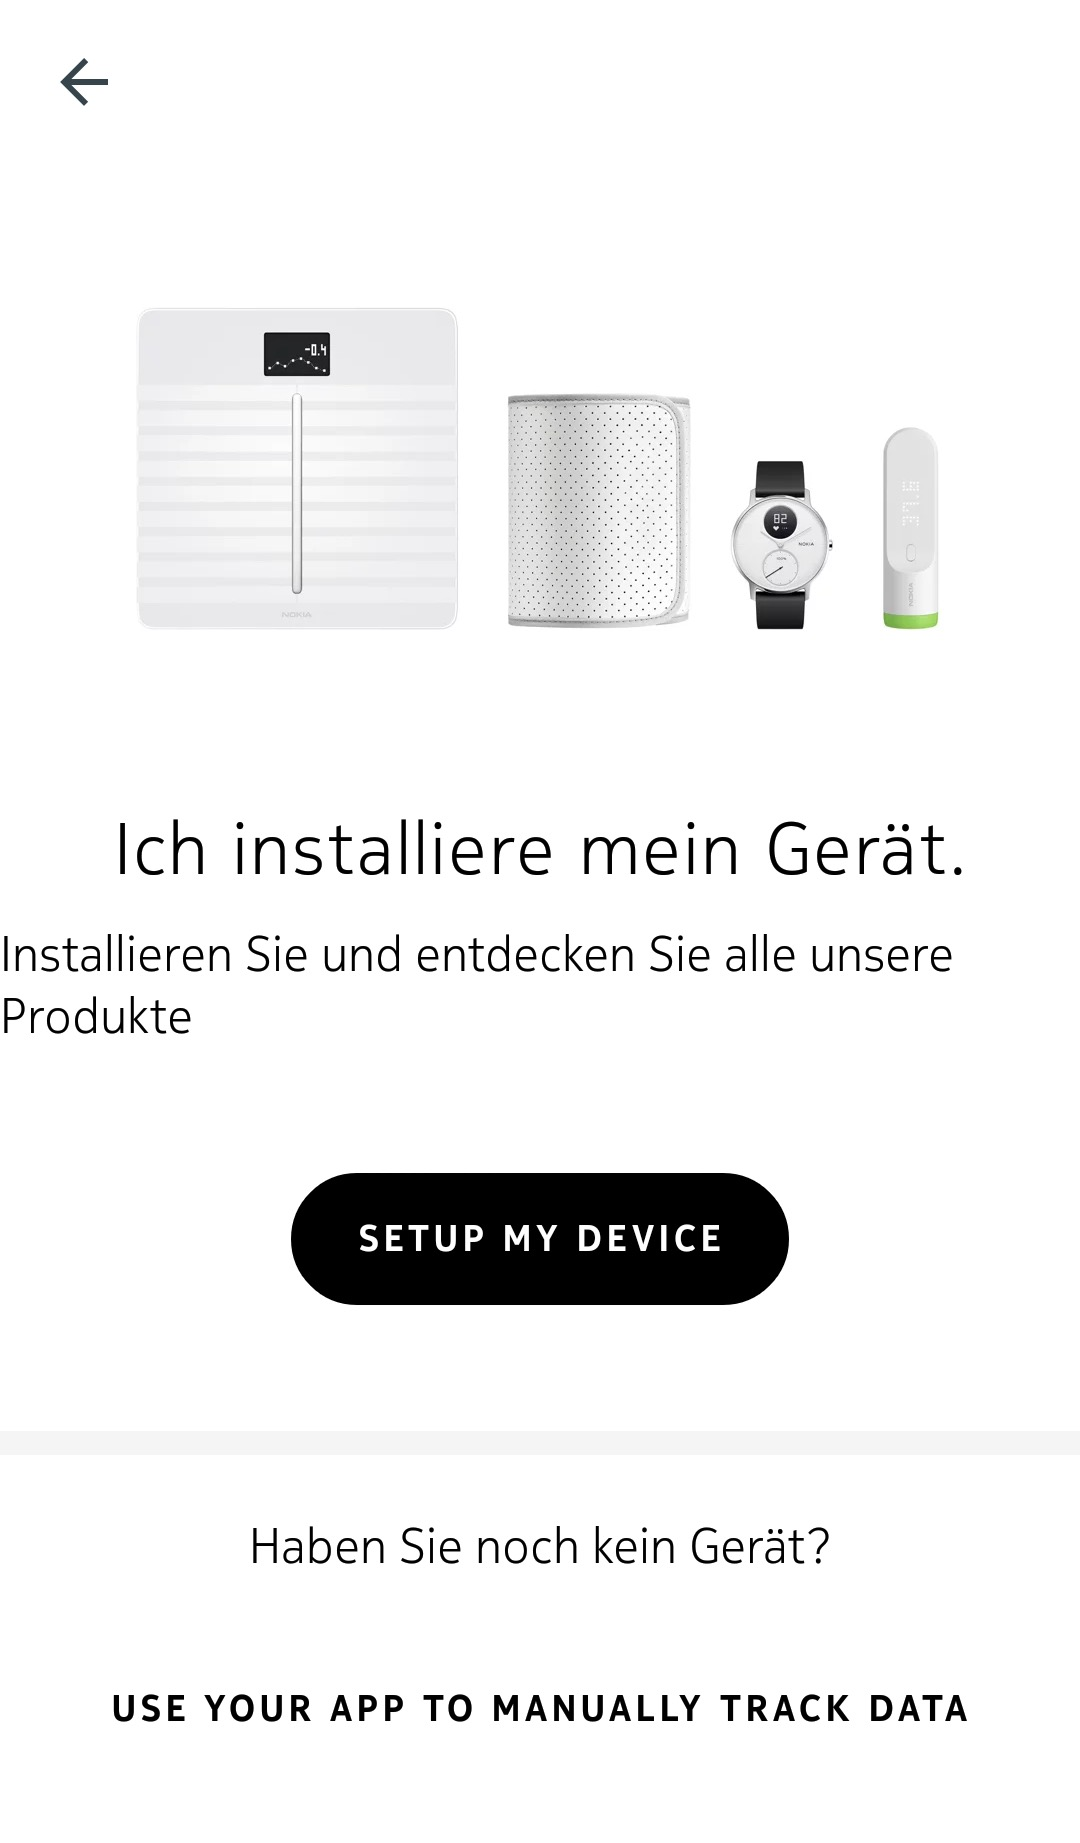 HM_android_installing_de.jpg